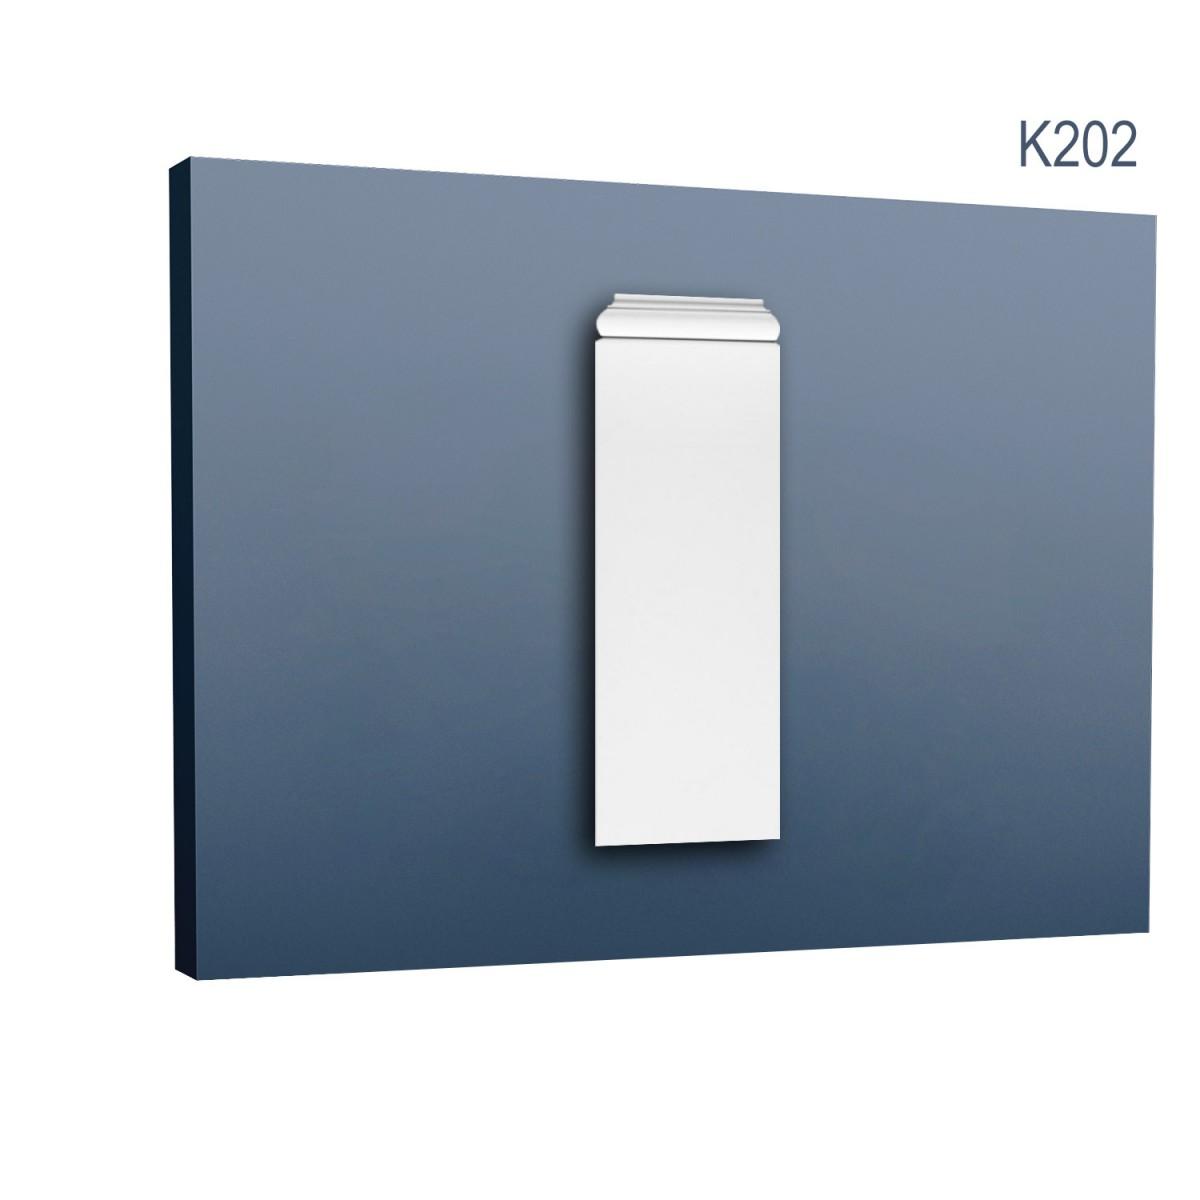 Baza Luxxus K202, Dimensiuni: 4.1 X 54.1 X 18.5 cm, Orac Decor